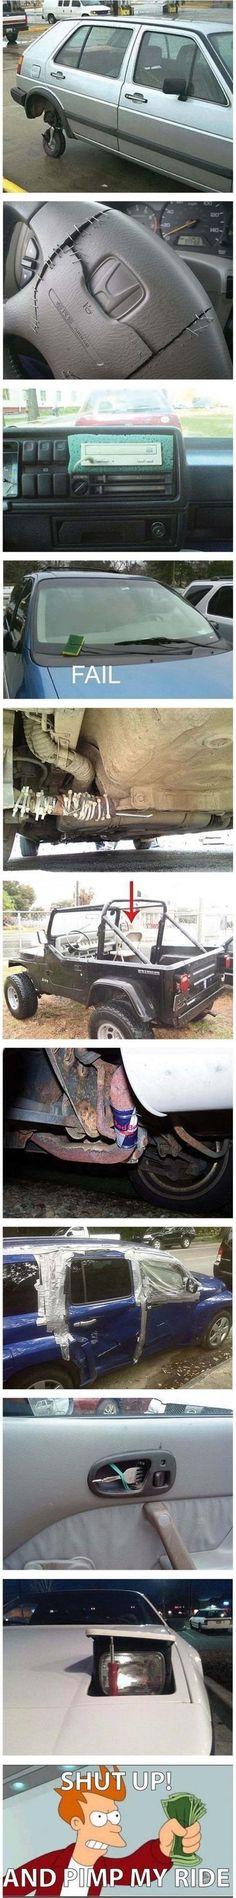 Car Reparation Fails  - www.meme-lol.com